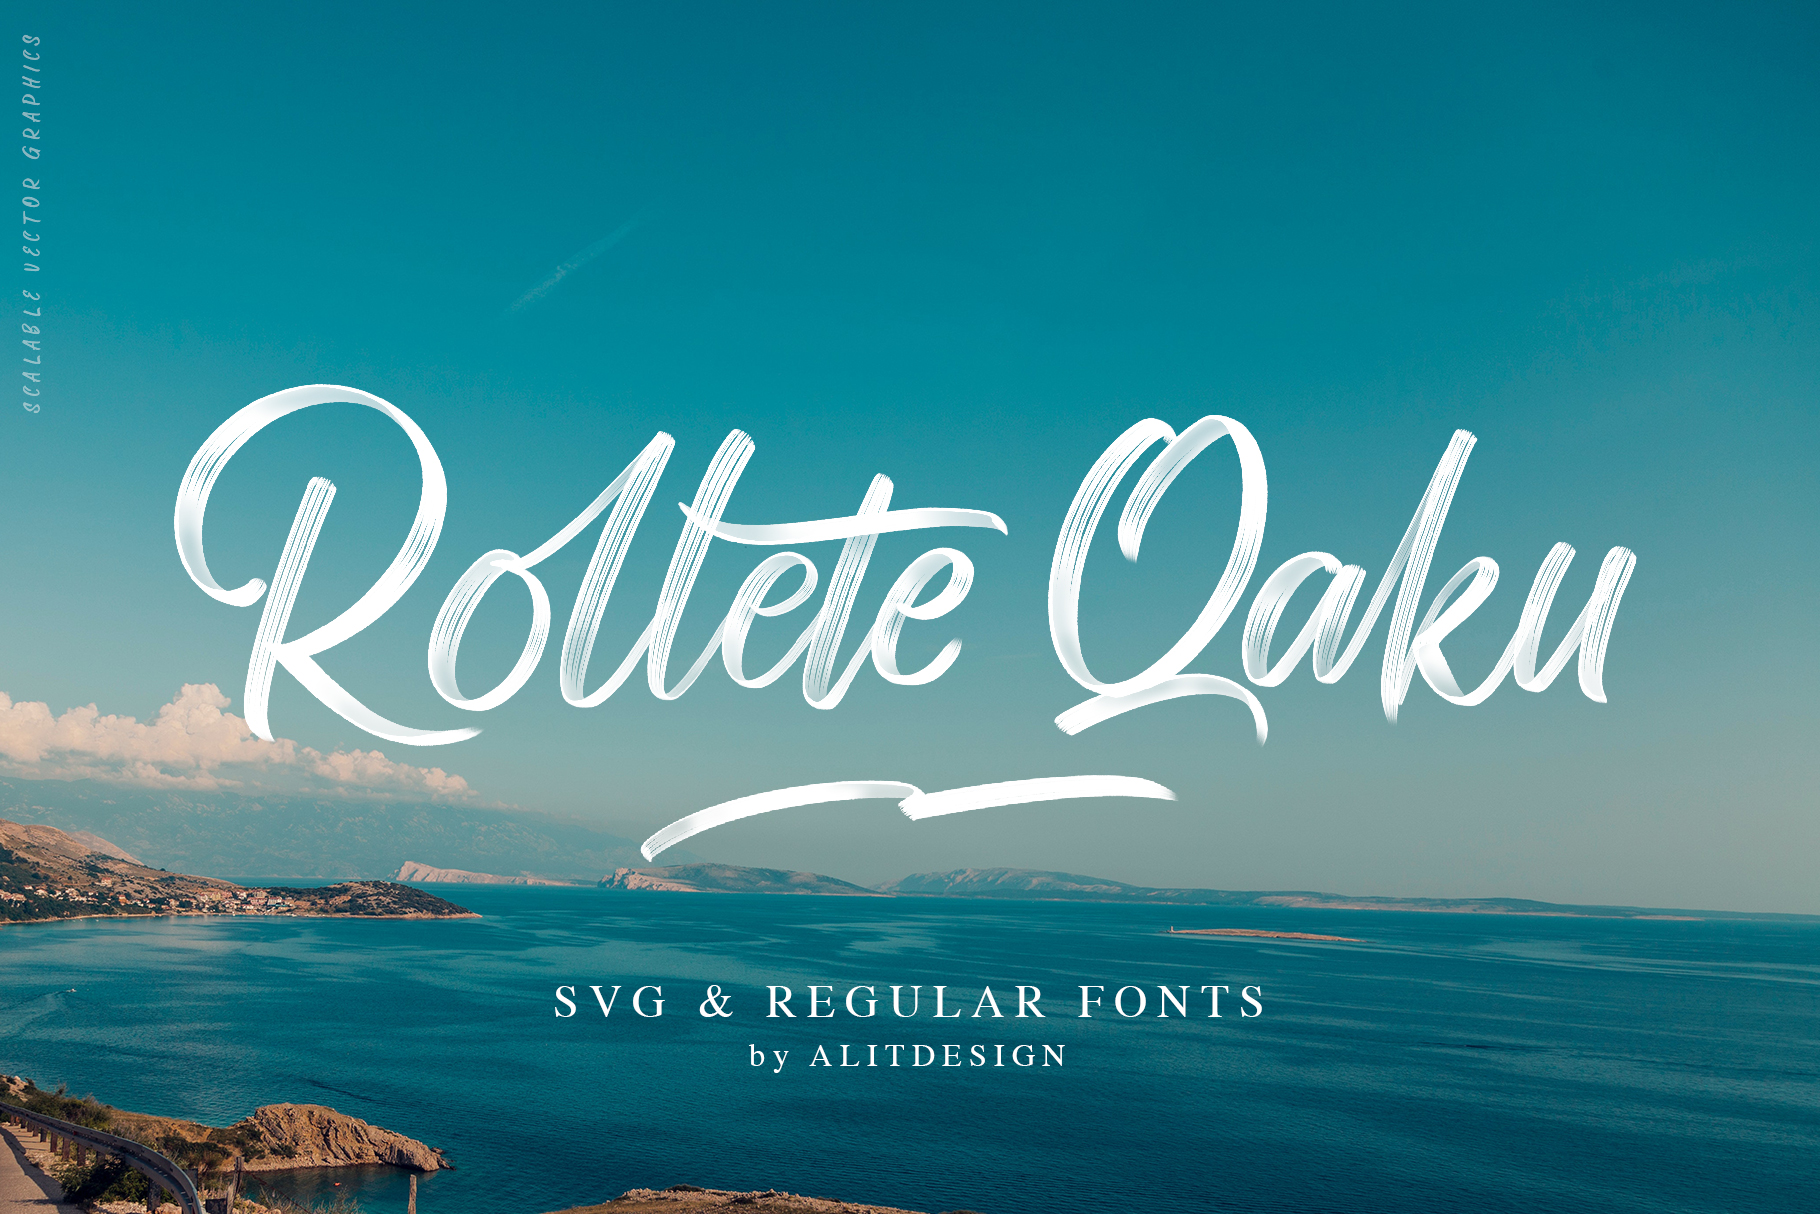 Rollete Qaku SVG & Regular fonts example image 1